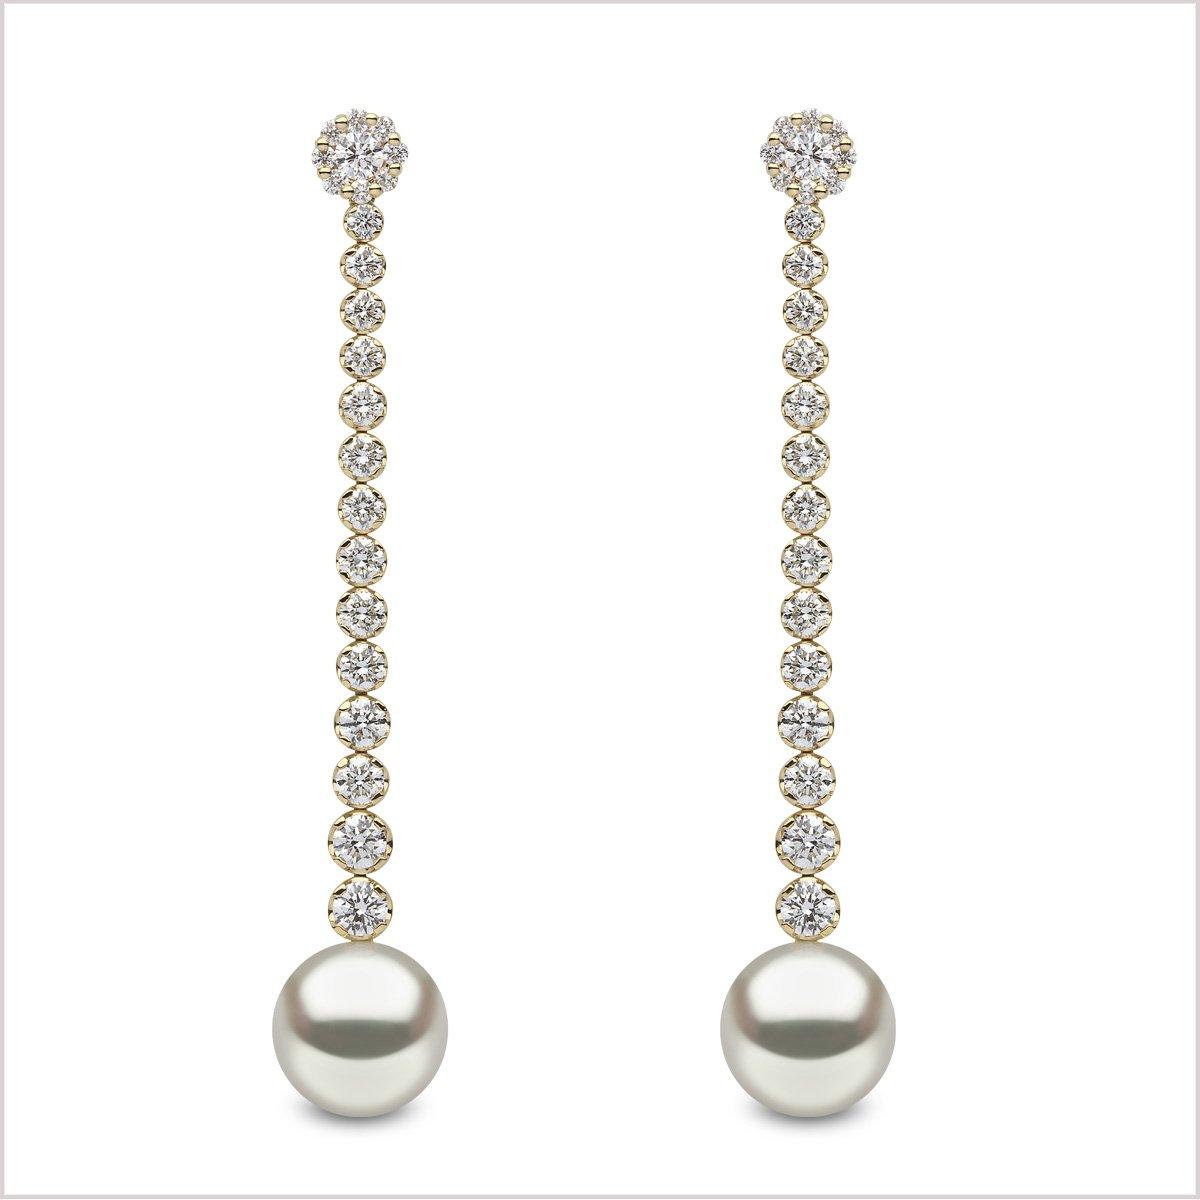 Yoko London Aurelia Diamond and South Sea Pearl Earrings